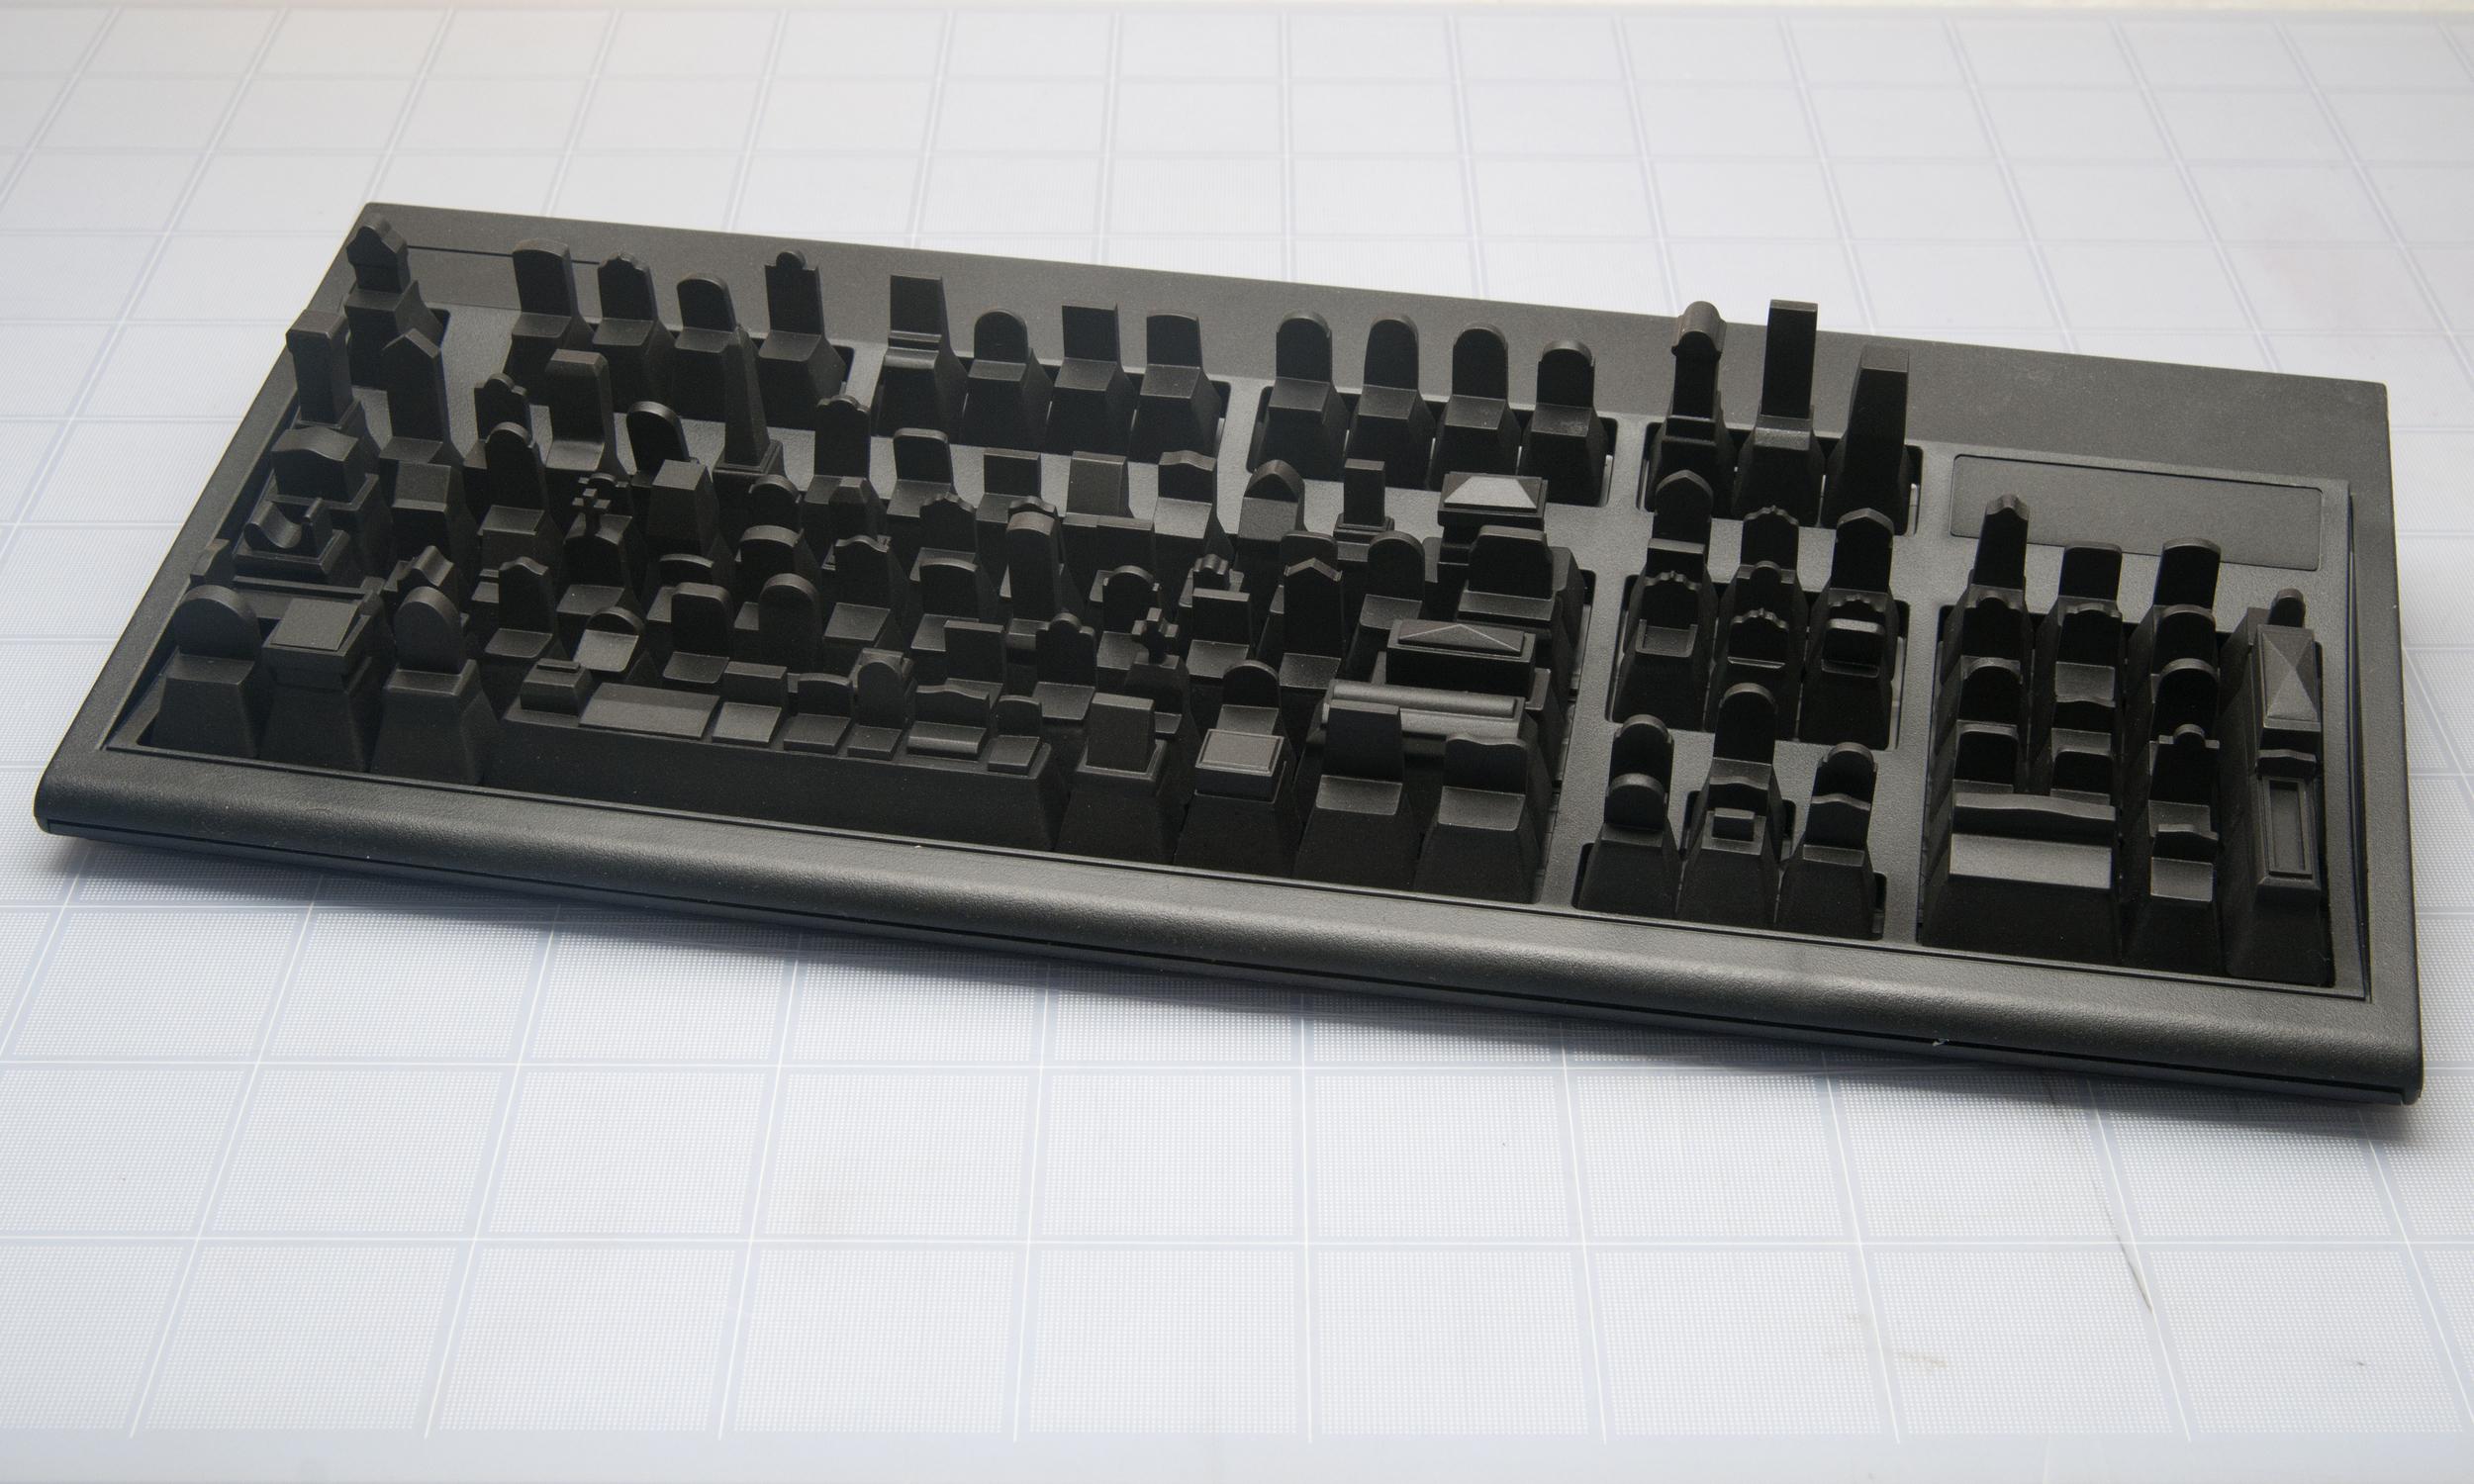 chan_keyboard_blk_cc.jpg